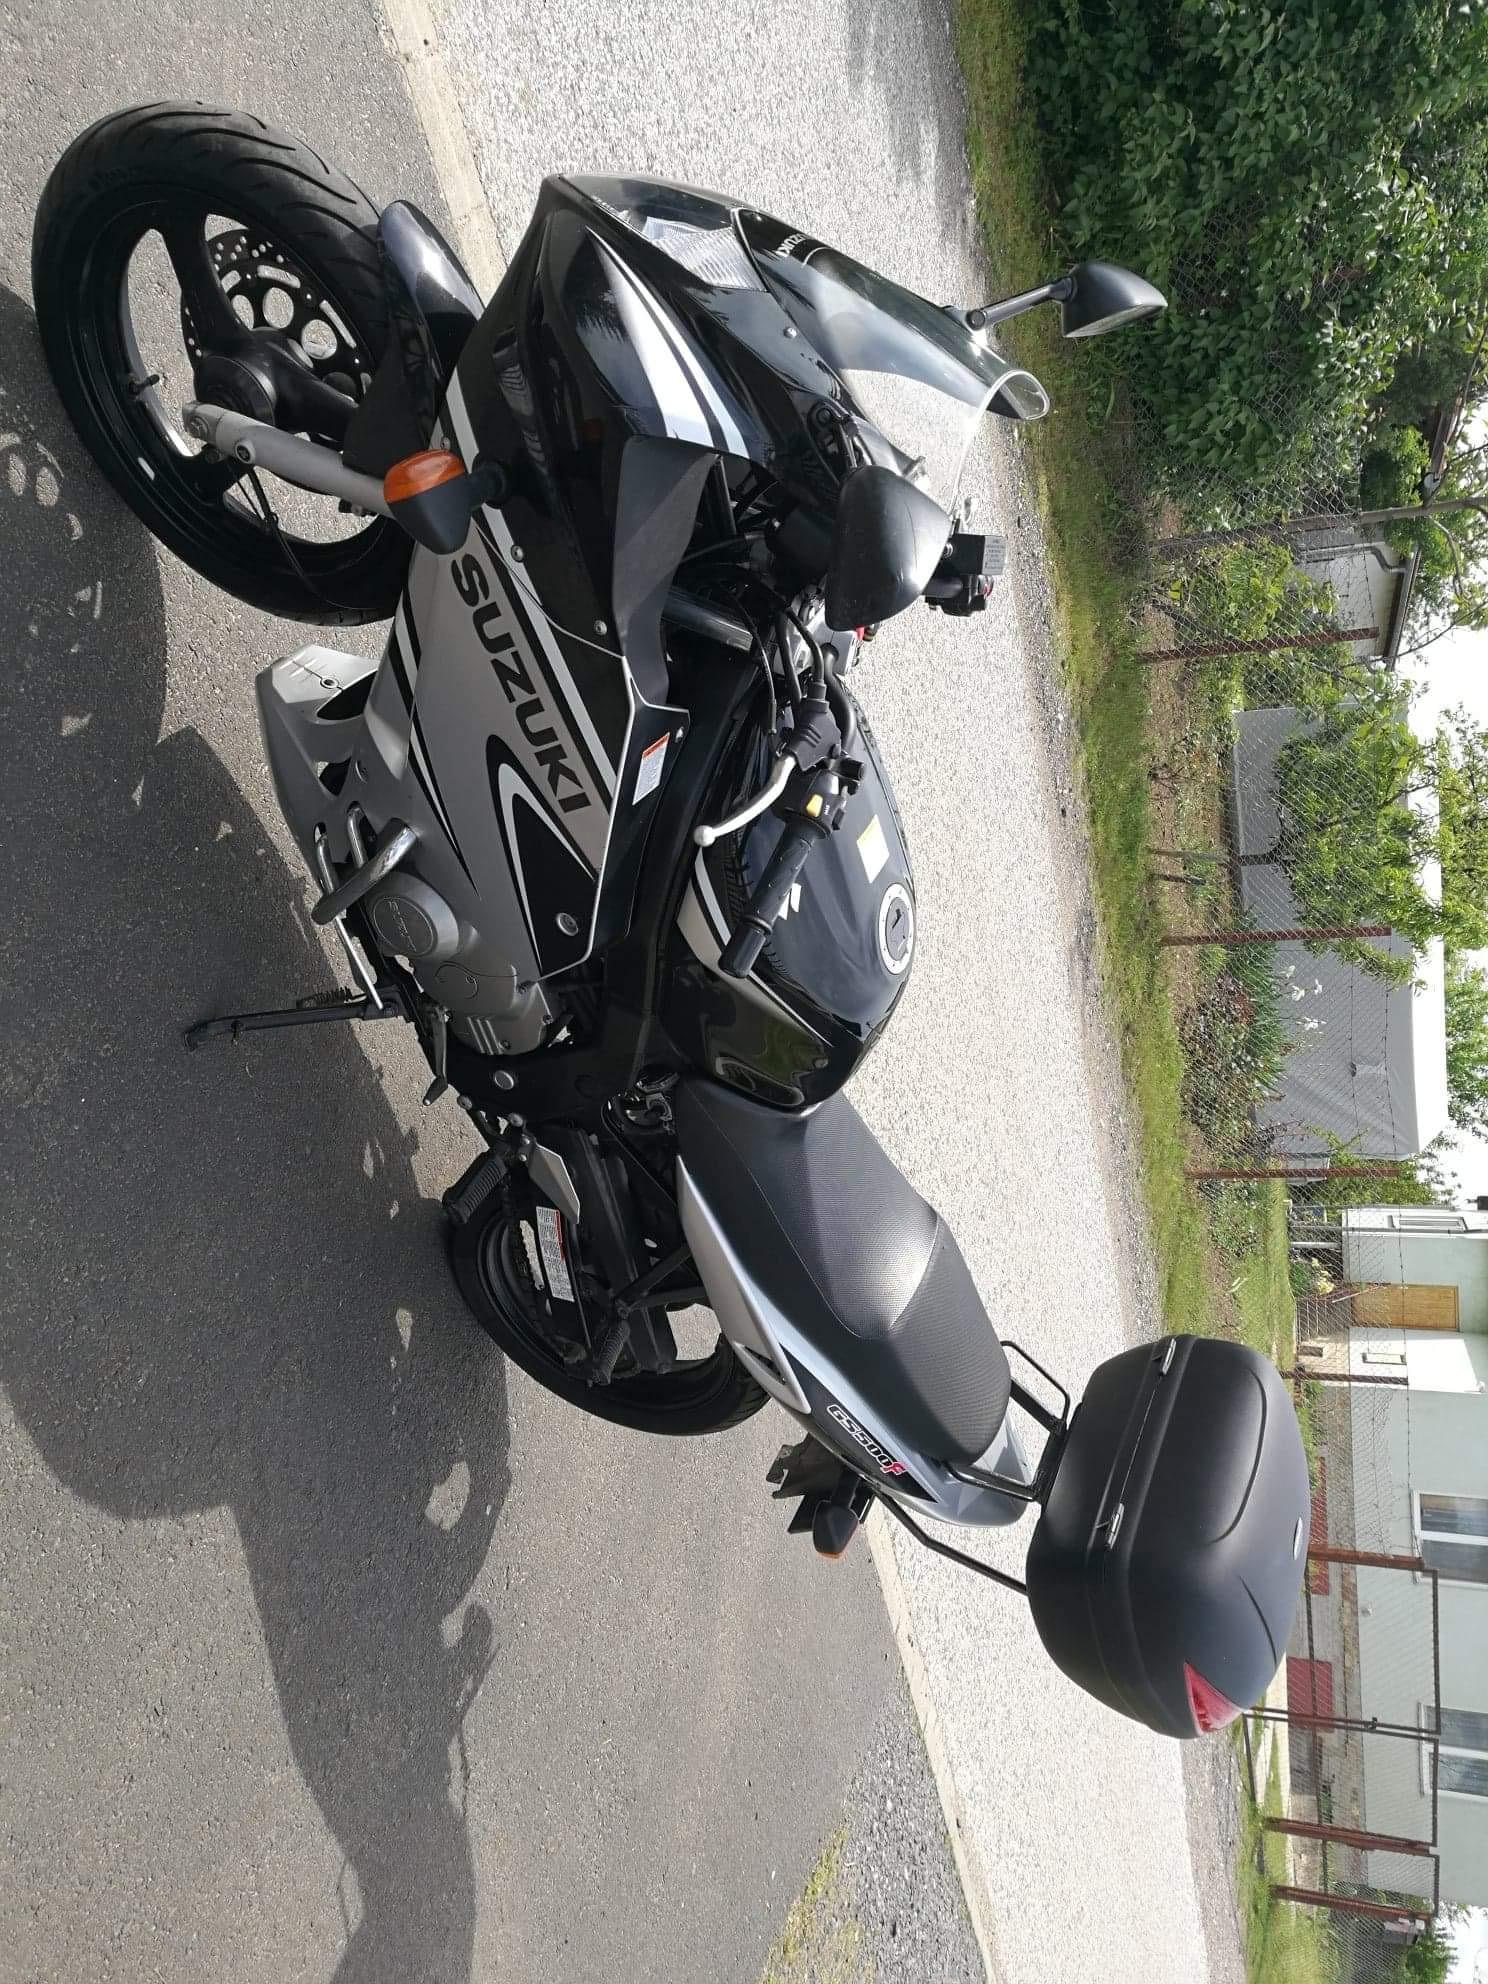 SUZUKI GS500F, 4. kép